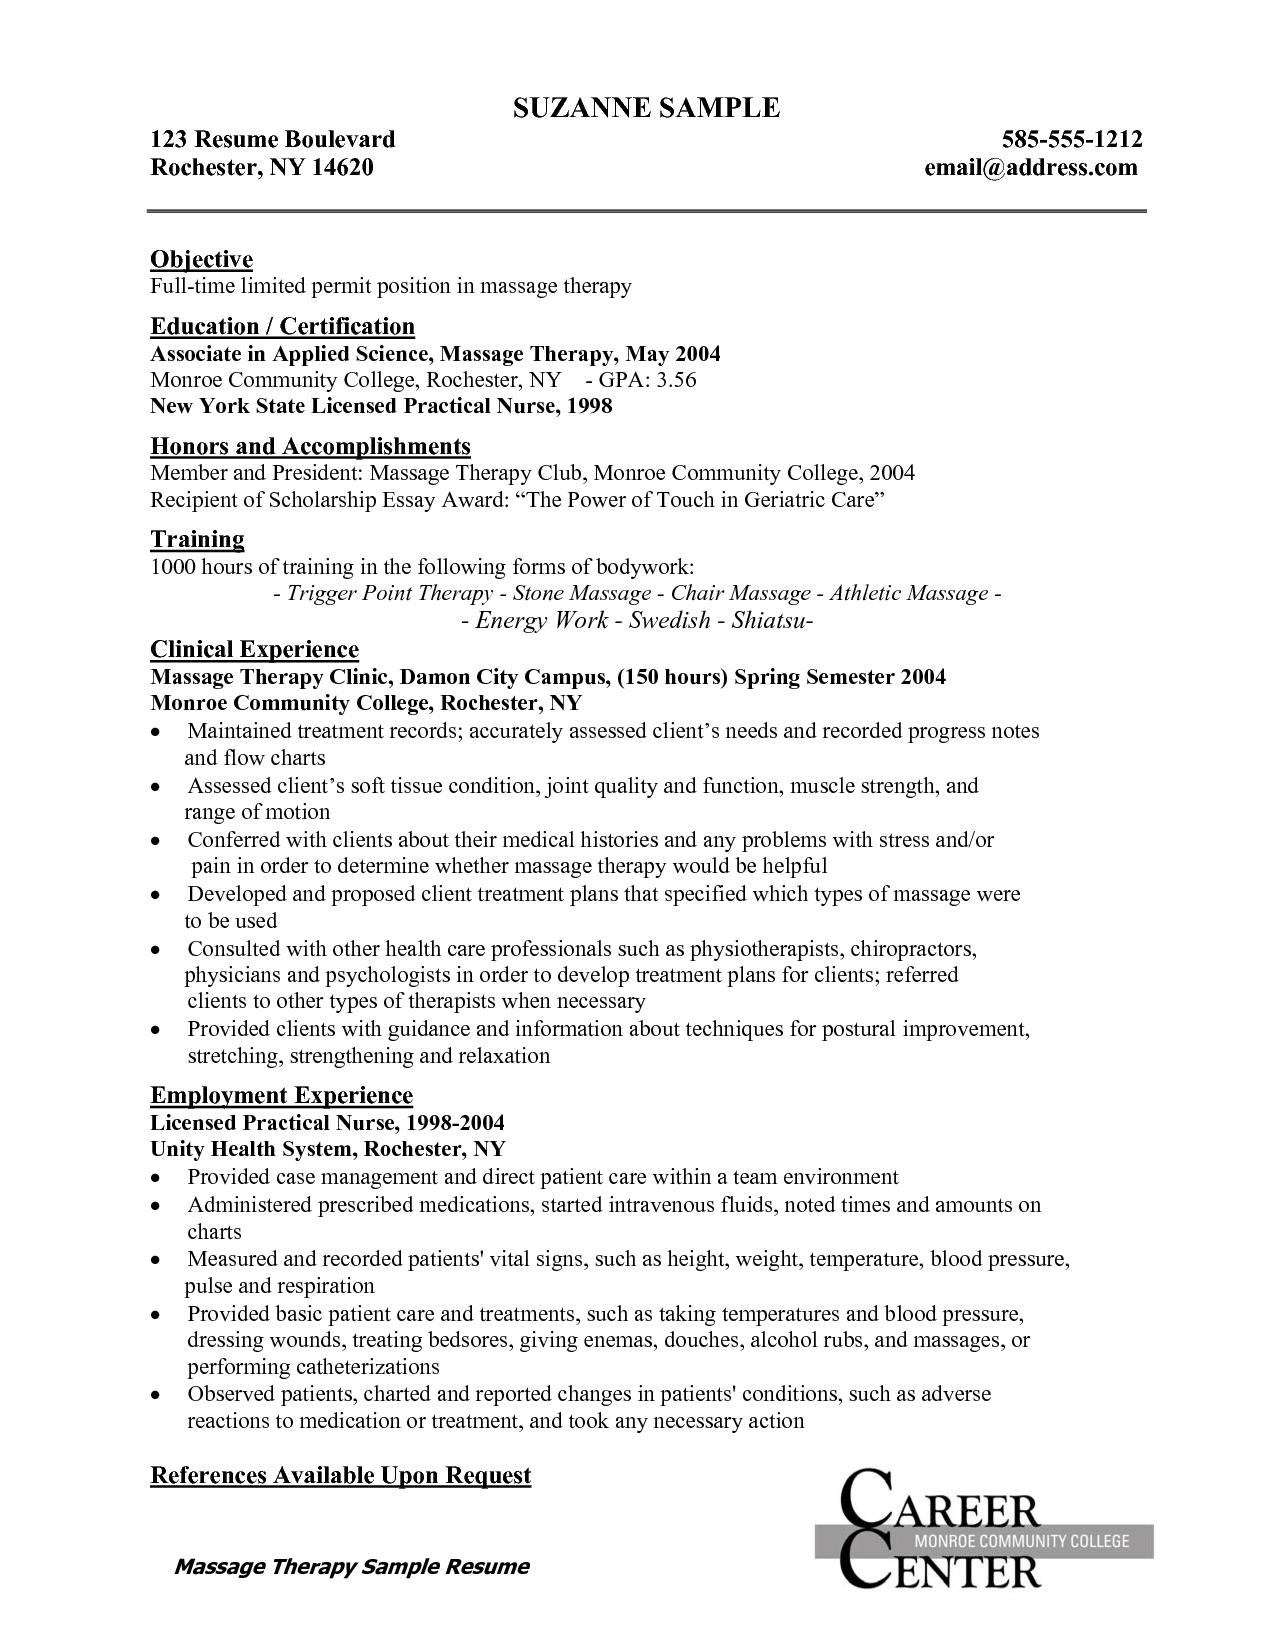 Free Resume Templates For Lpn Nurses Freeresumetemplates Nurses Resume Templates Nursing Resume Registered Nurse Resume Lpn Resume